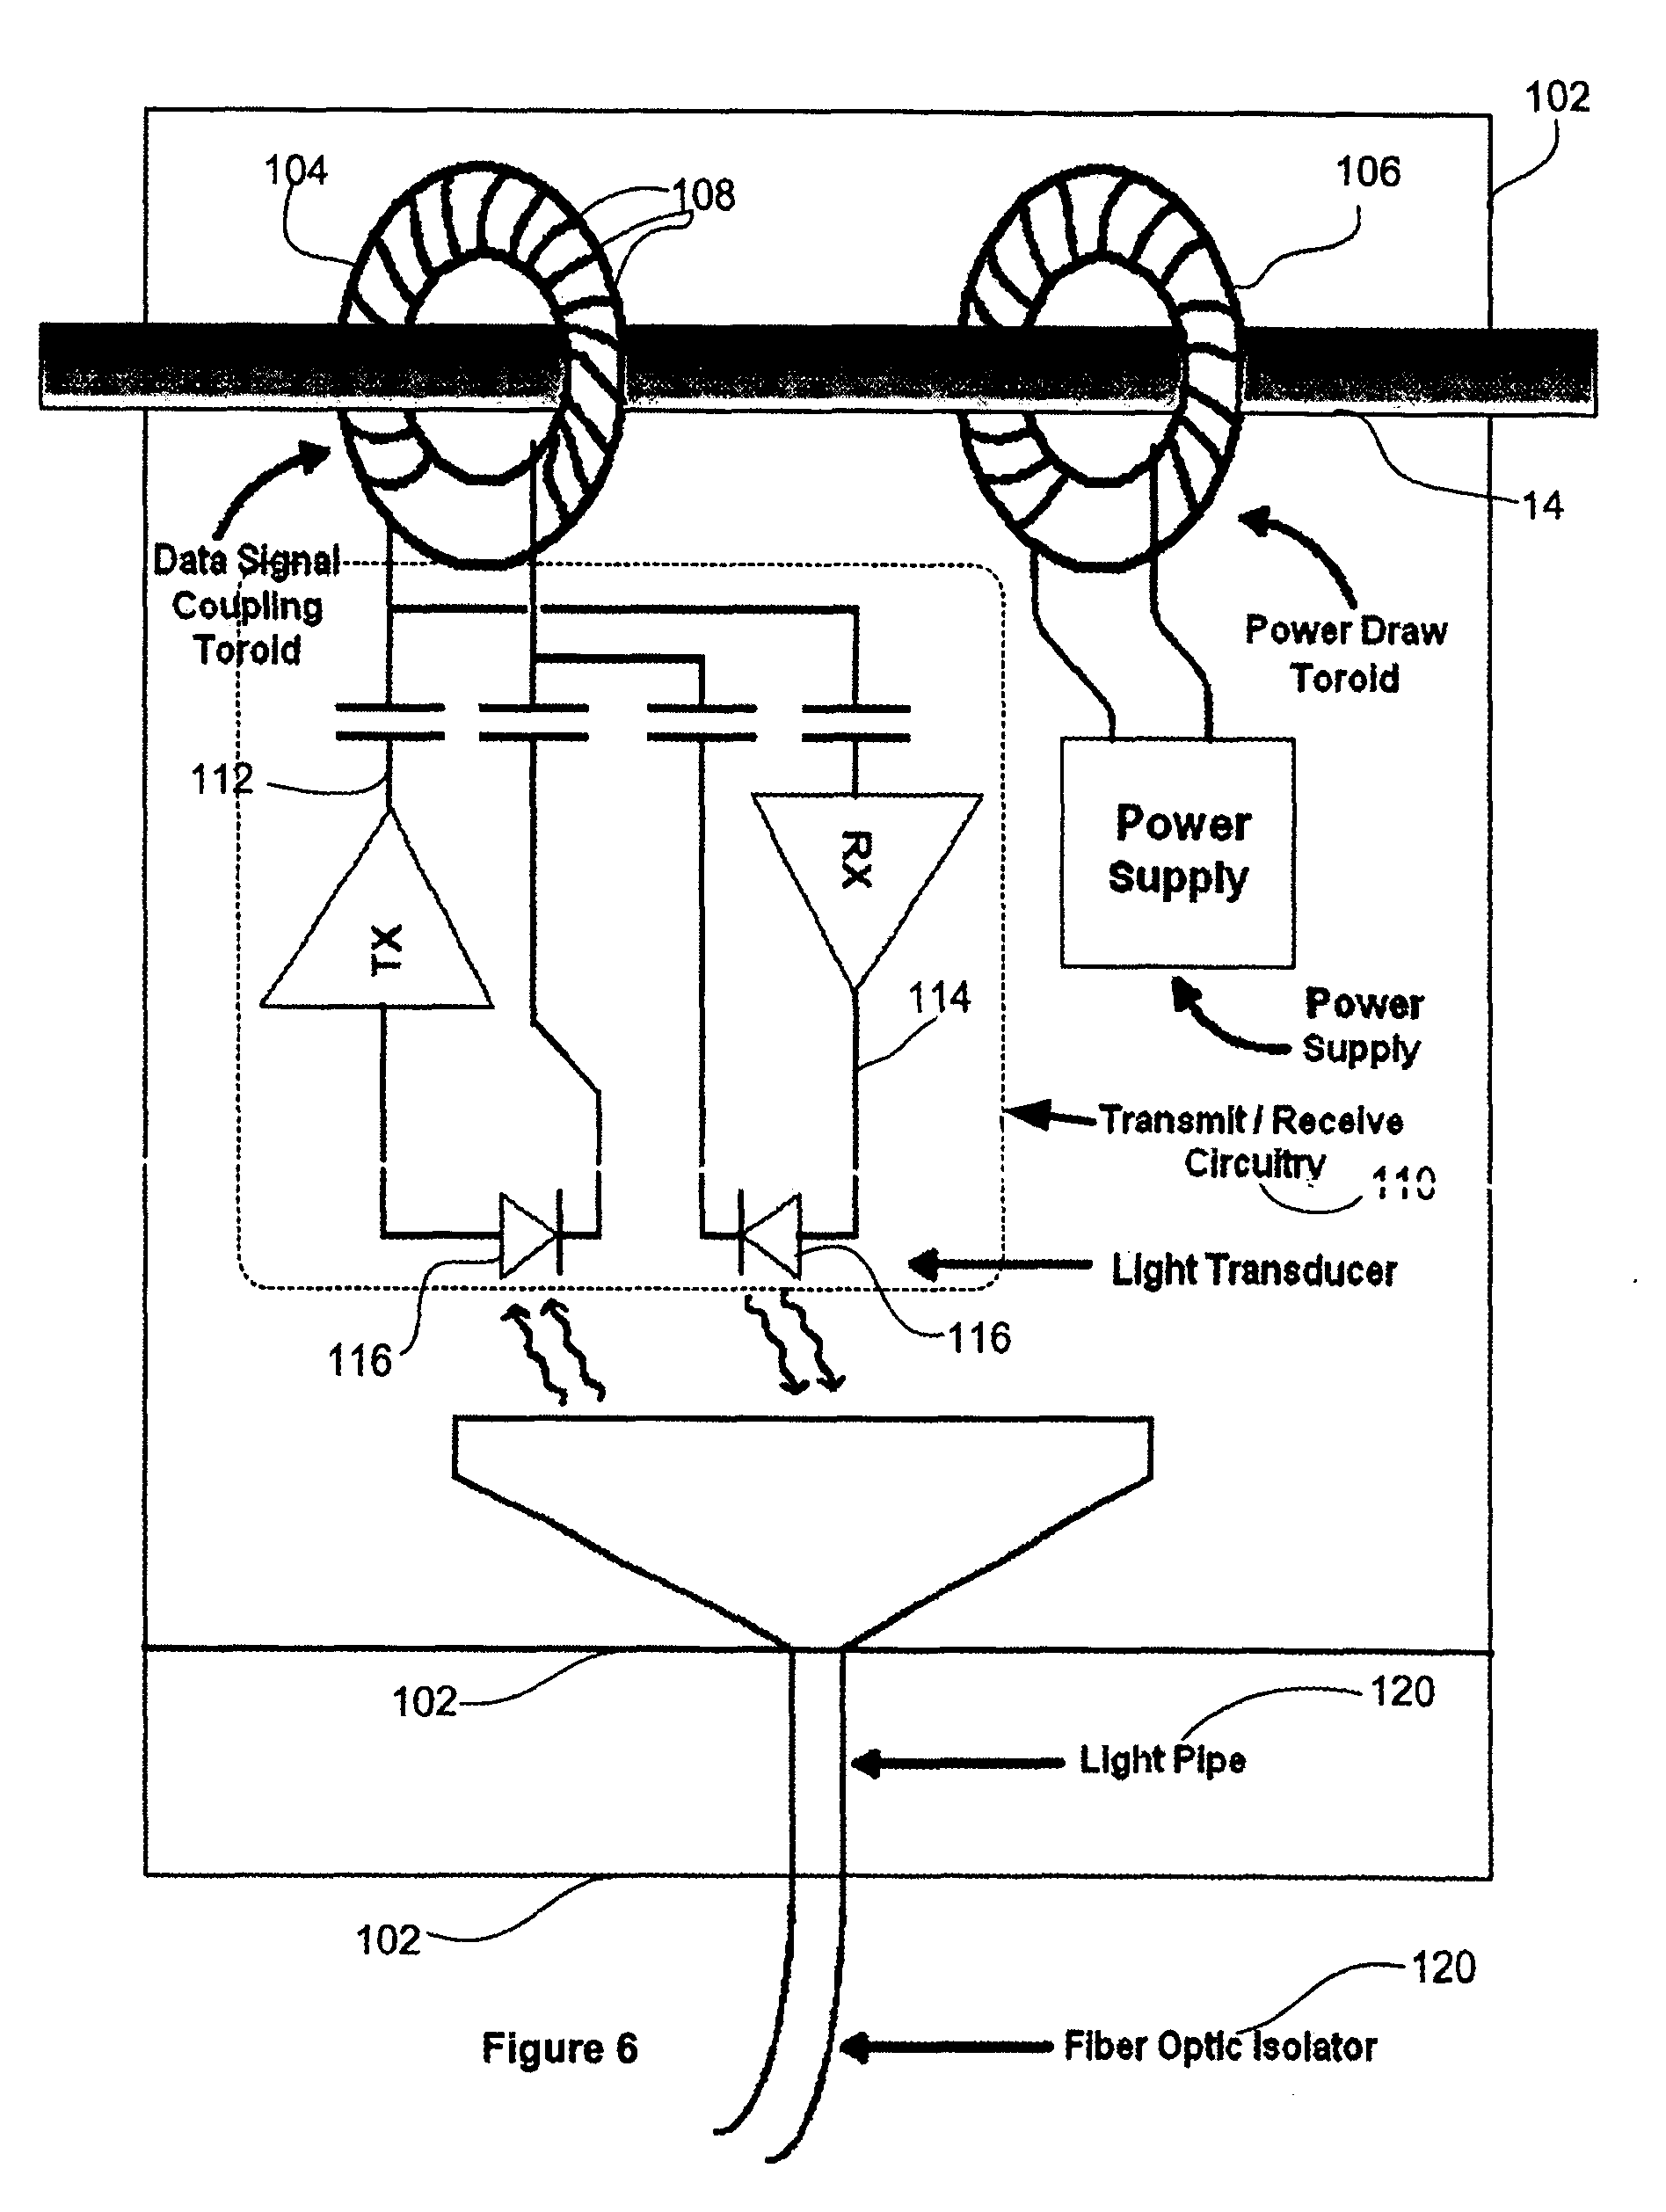 Compressor Wiring Diagram Sanyo Cae2420z Compressor Wiring Diagram